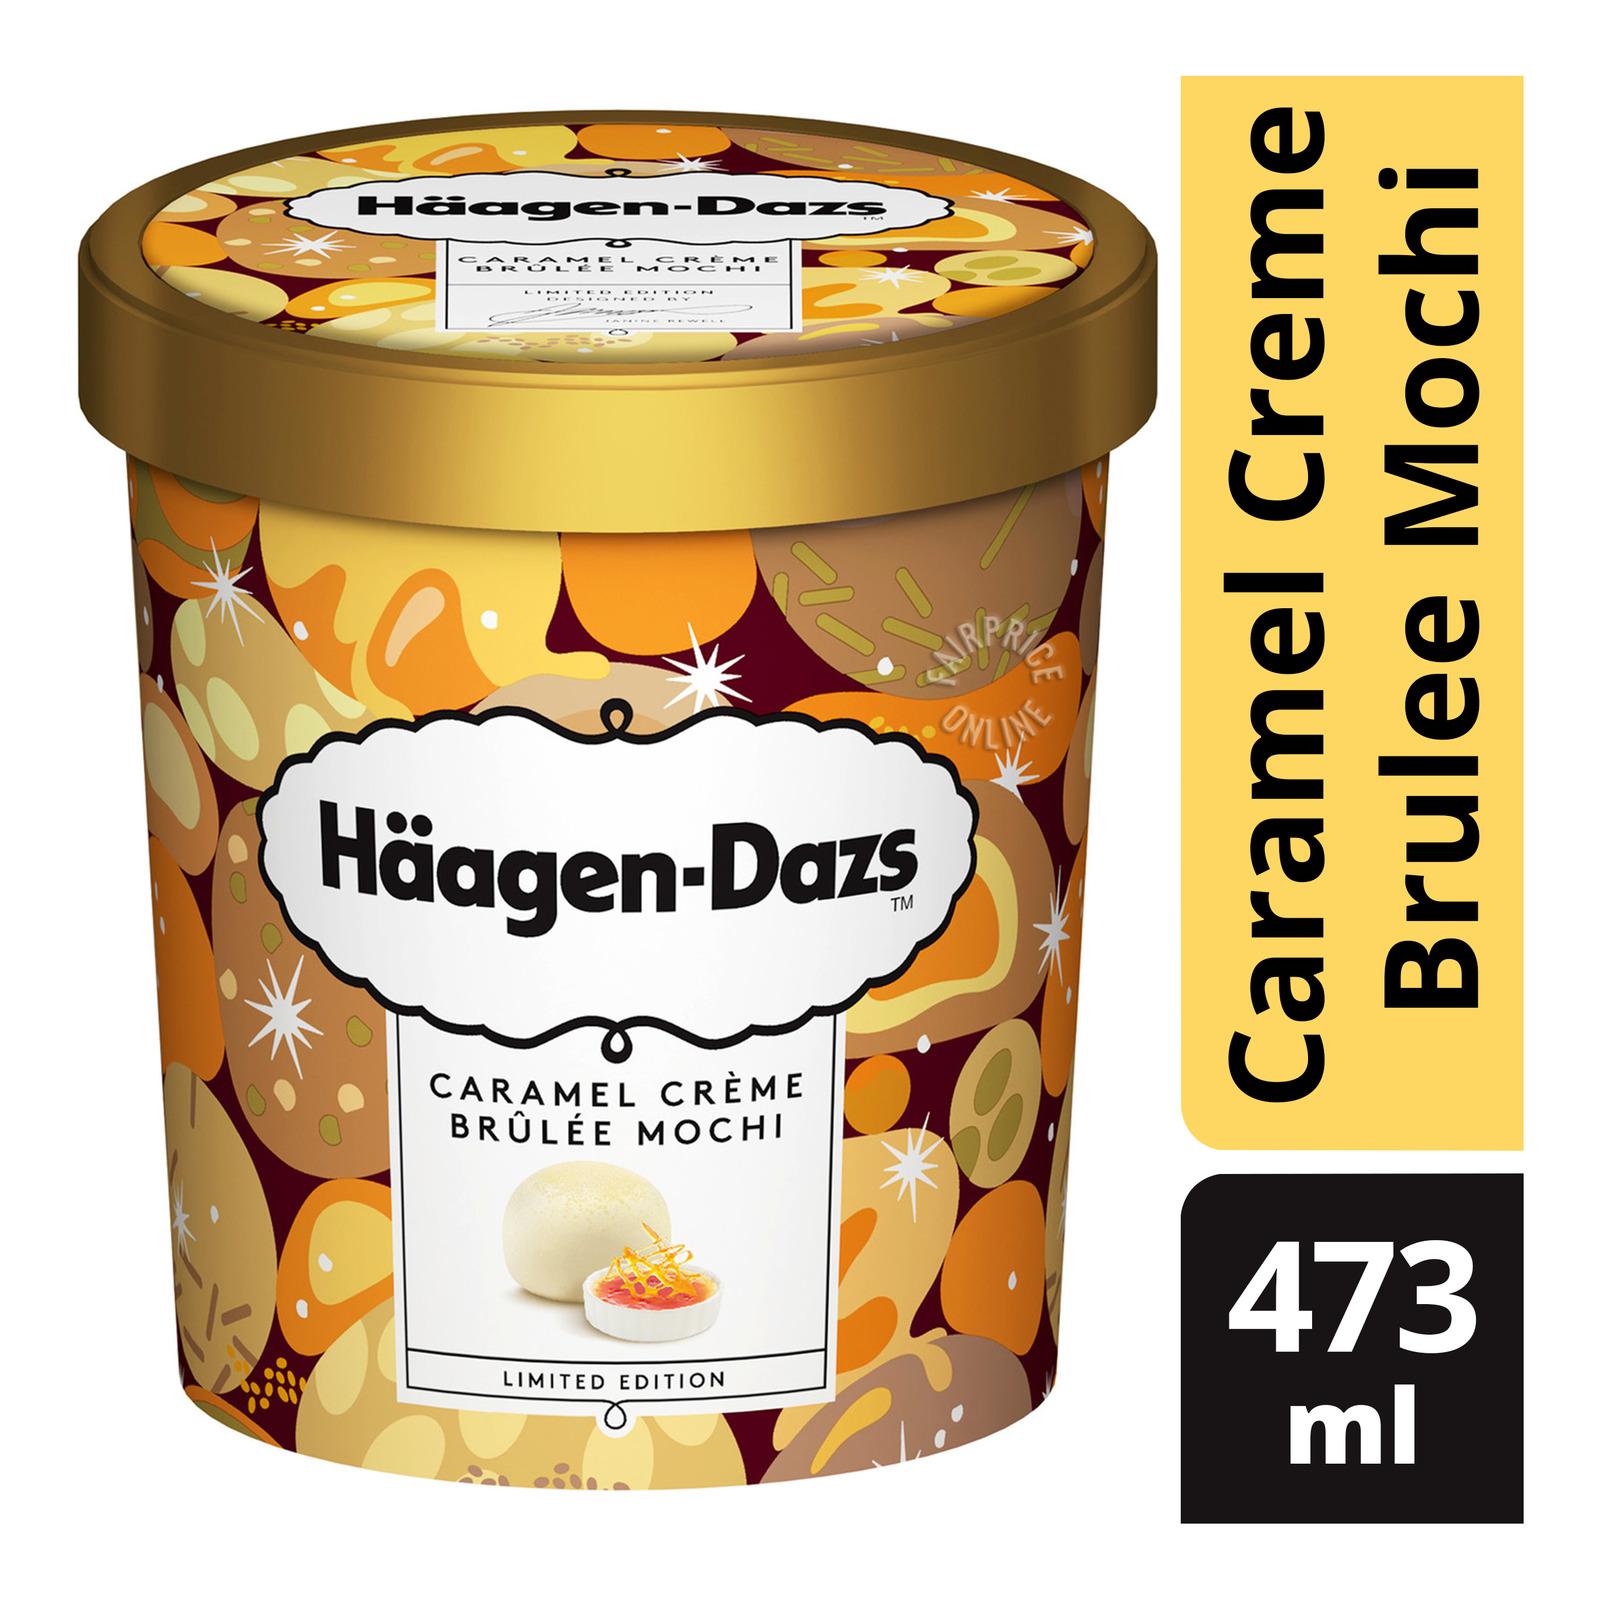 Haagen-Dazs Ice Cream - Caramel Creme Brulee Mochi